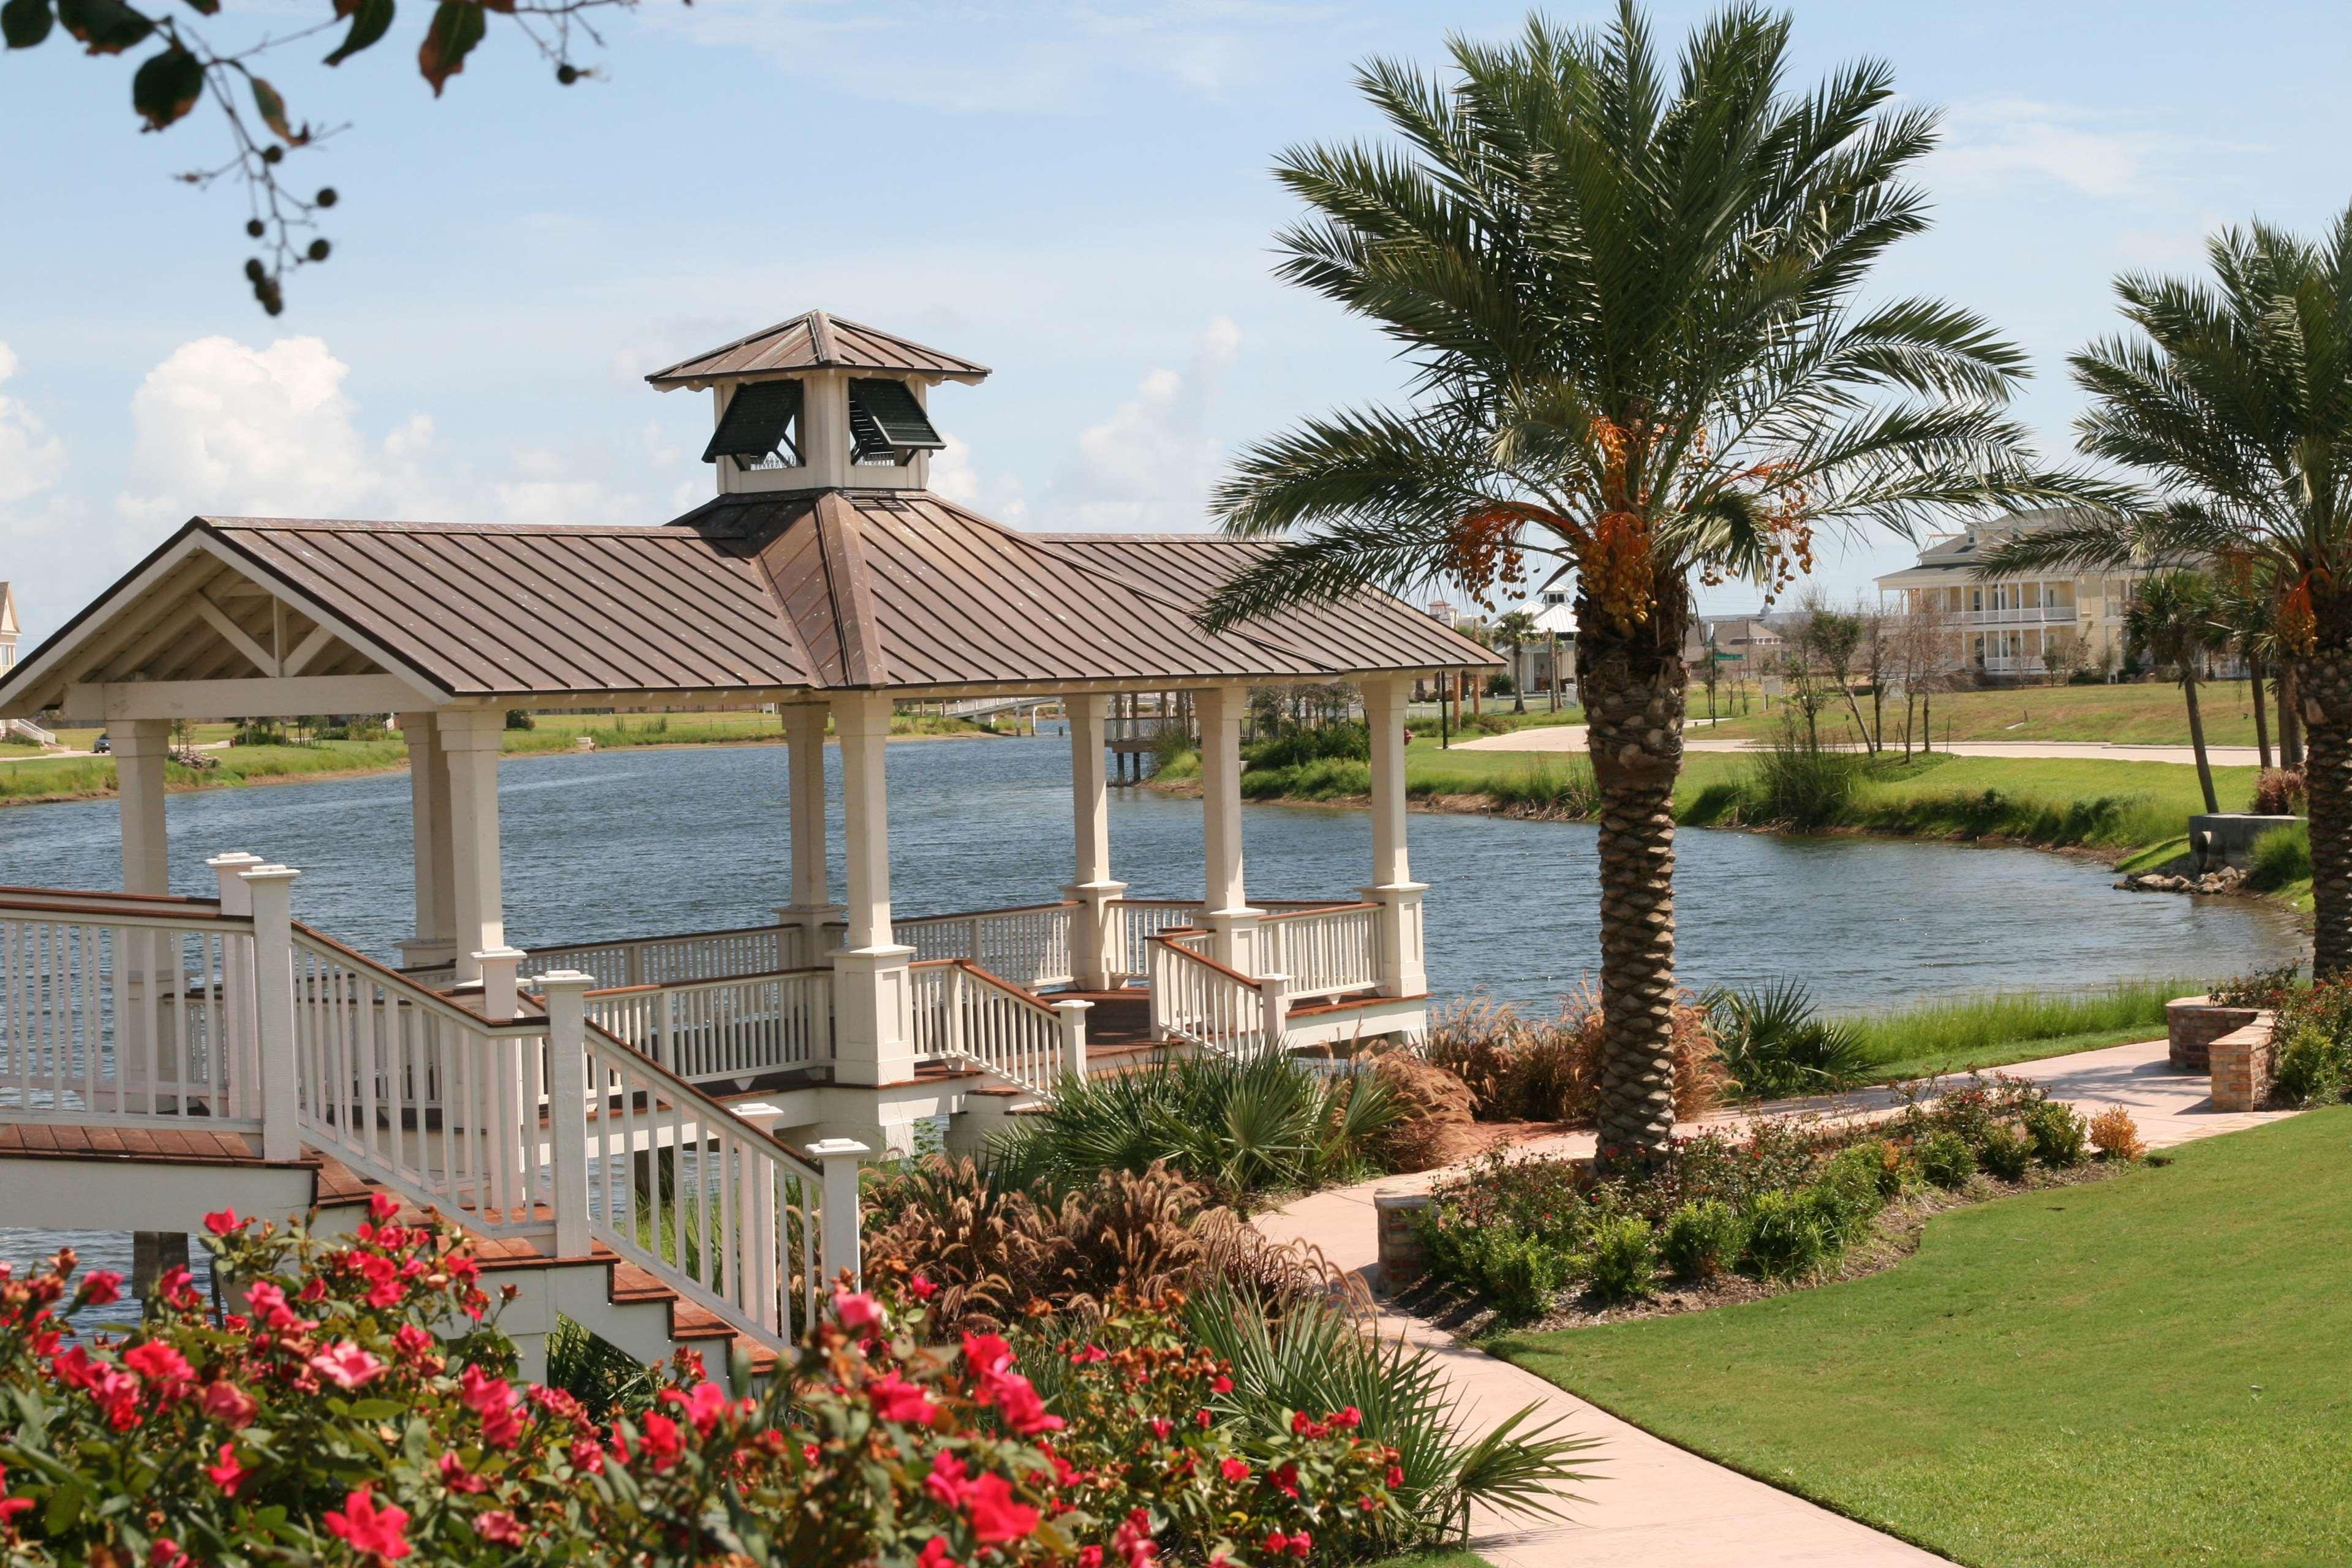 Hampton Inn & Suites Galveston image 4